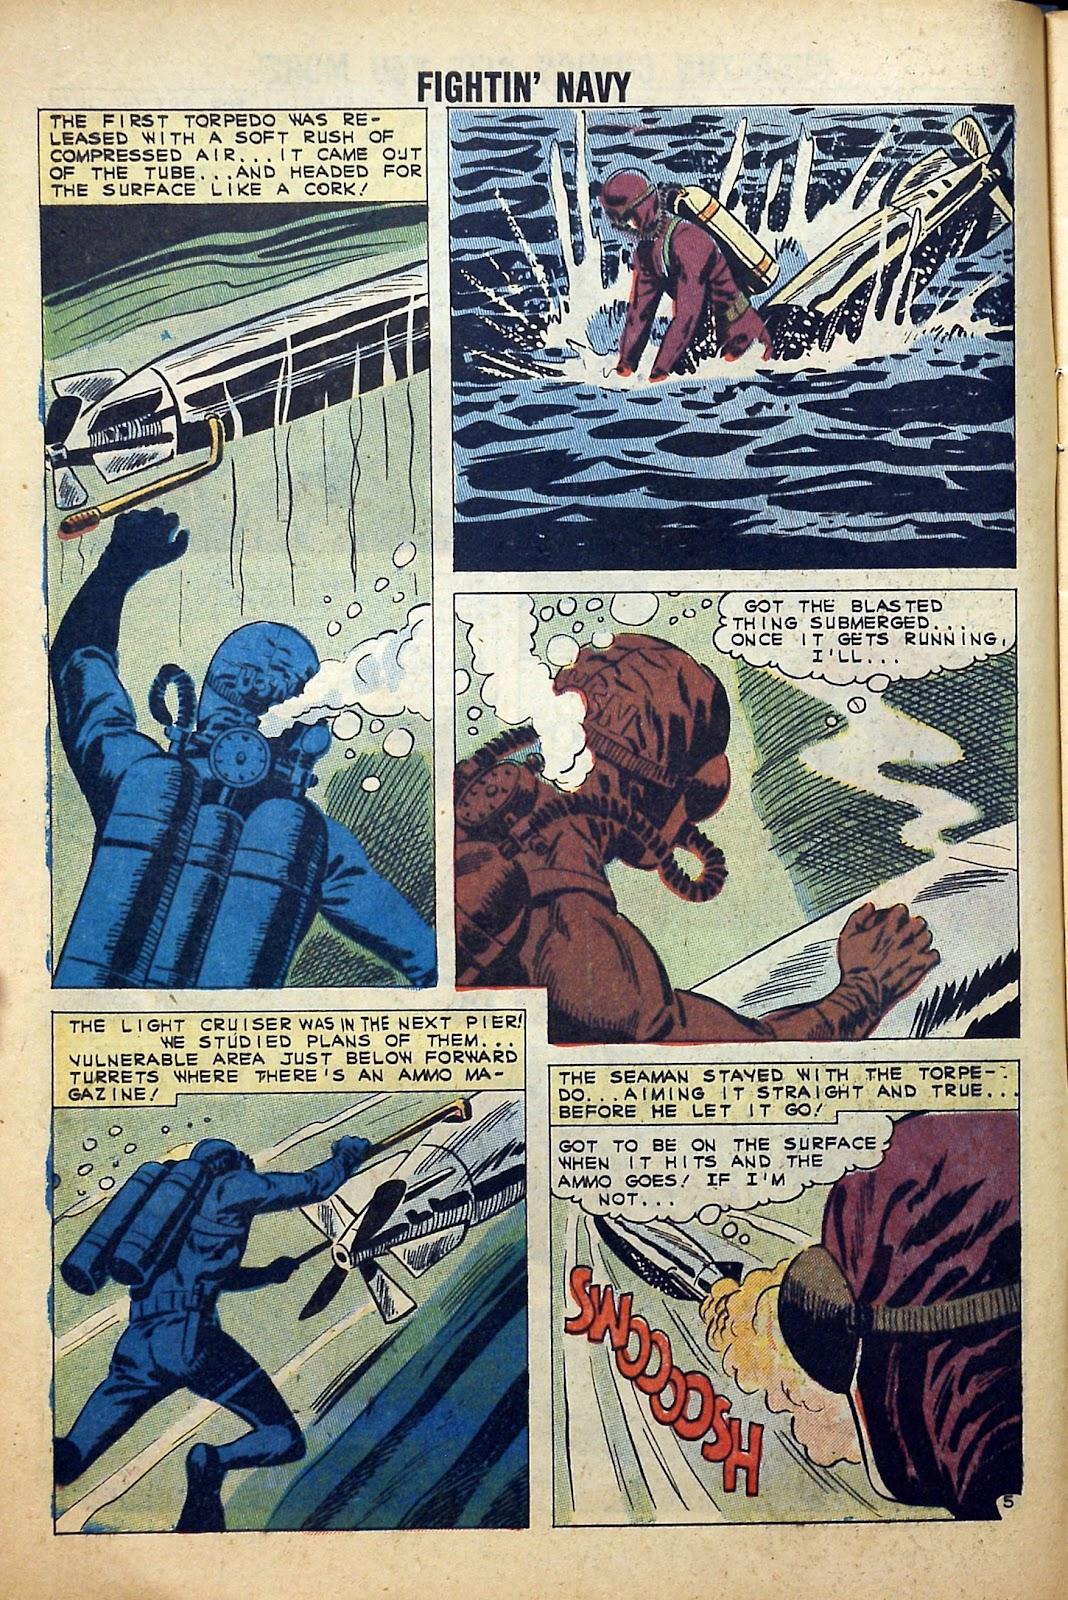 Read online Fightin' Navy comic -  Issue #99 - 8